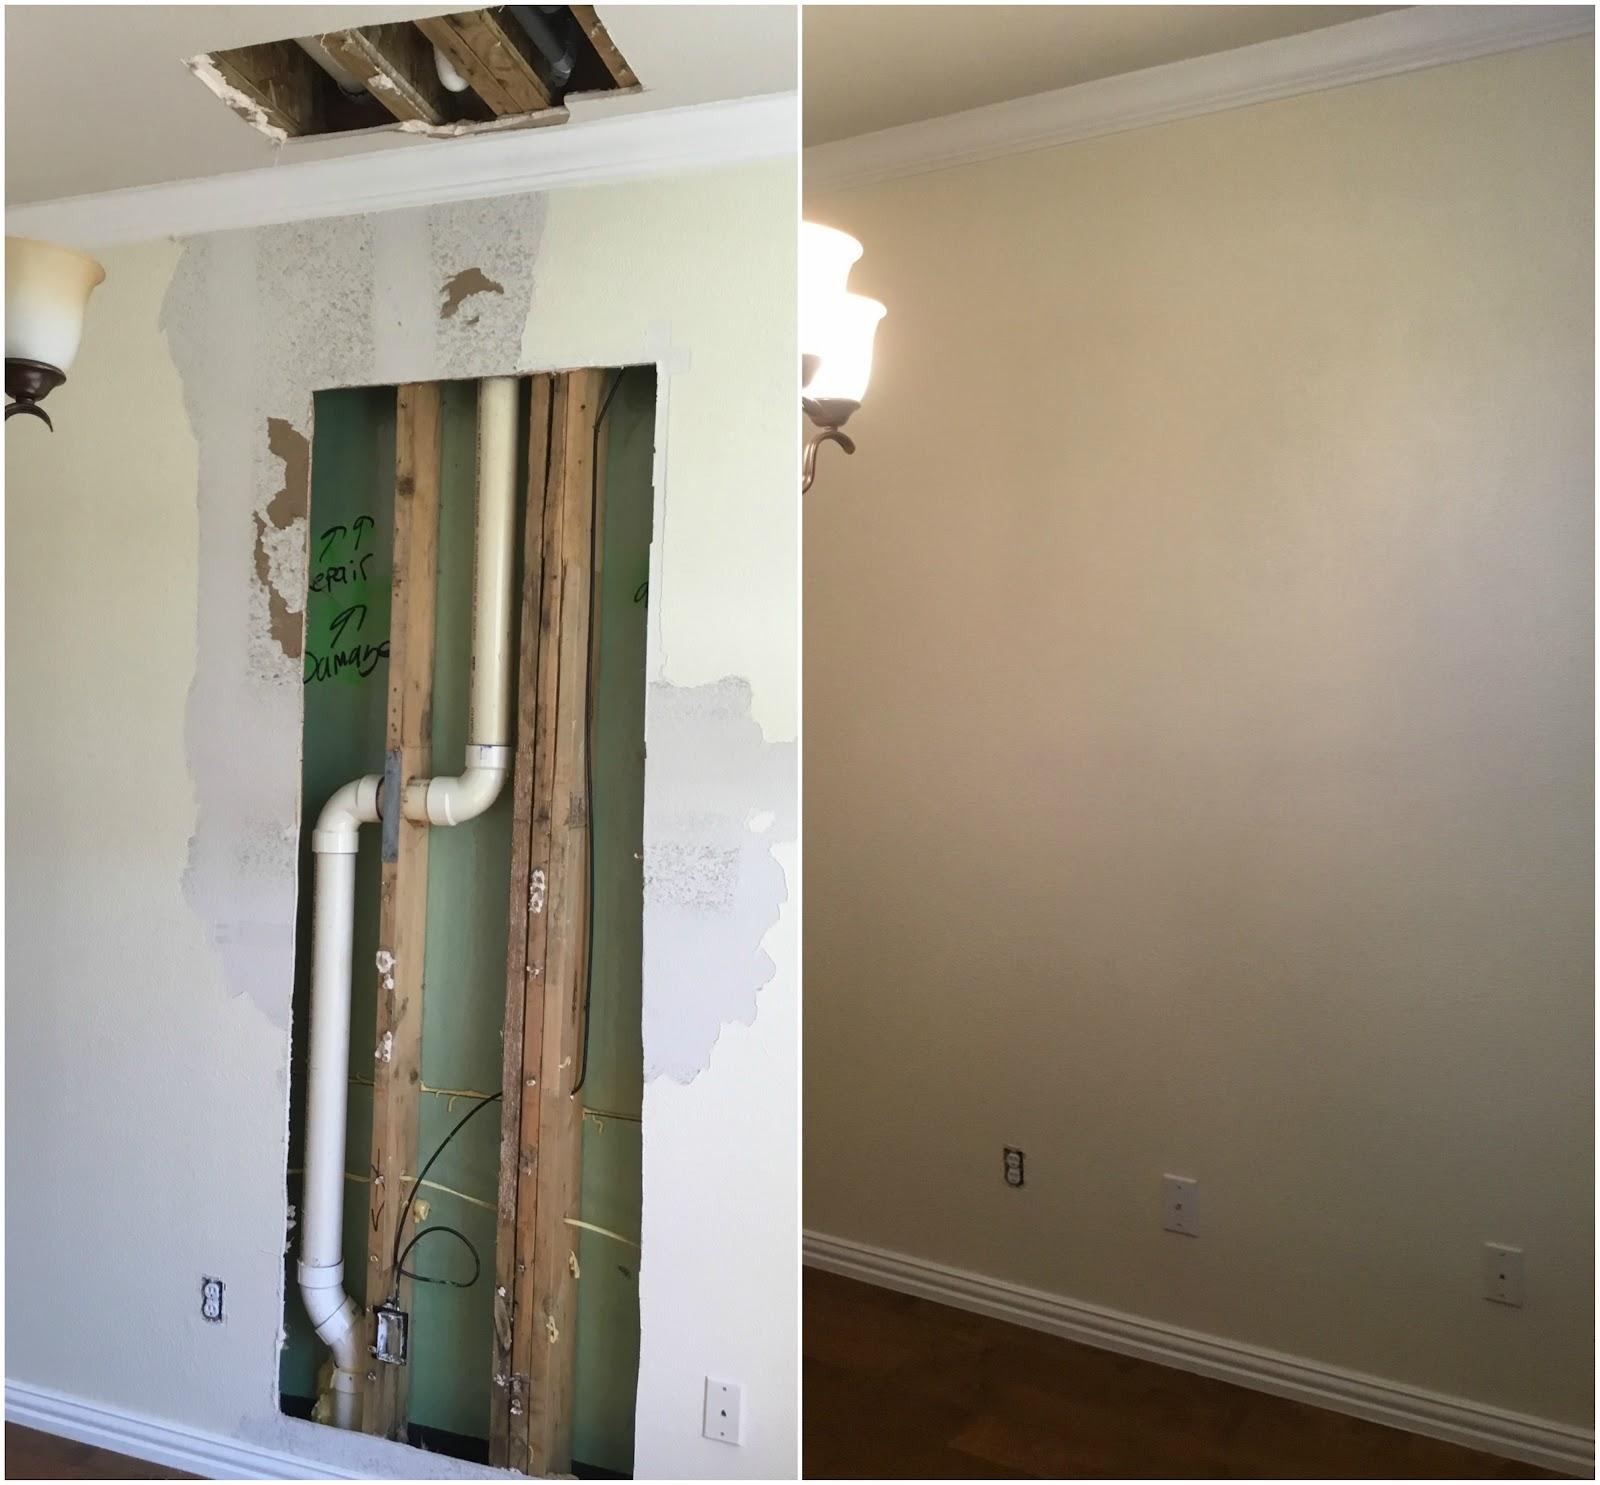 Handyman Allen drywall repair.